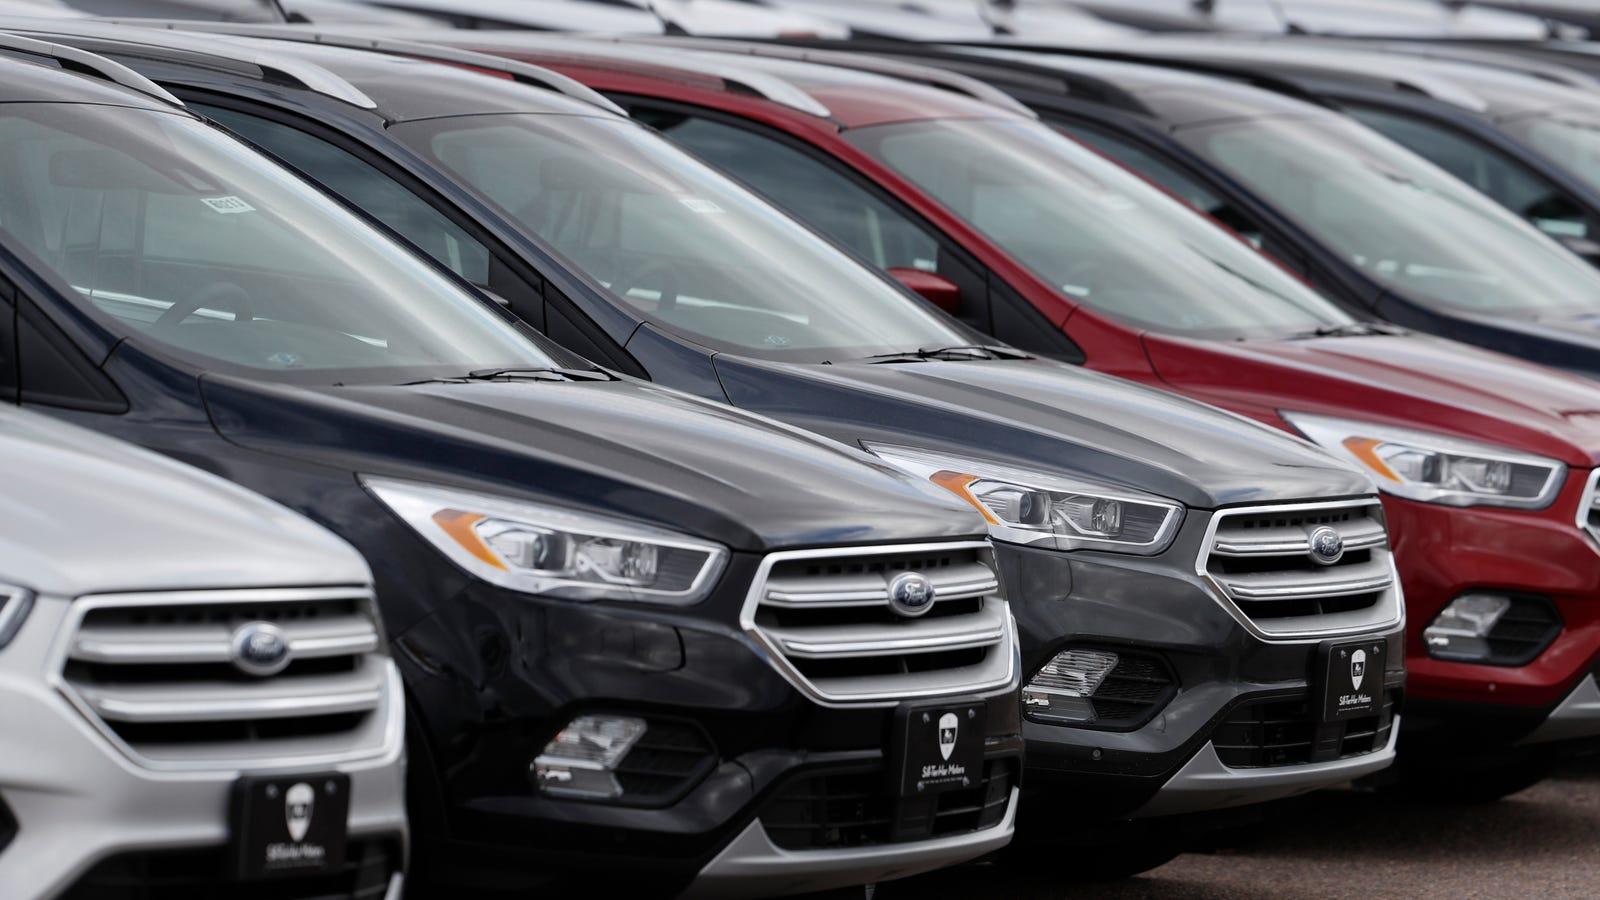 Feds Launch Antitrust Investigation Into Four Car Companies